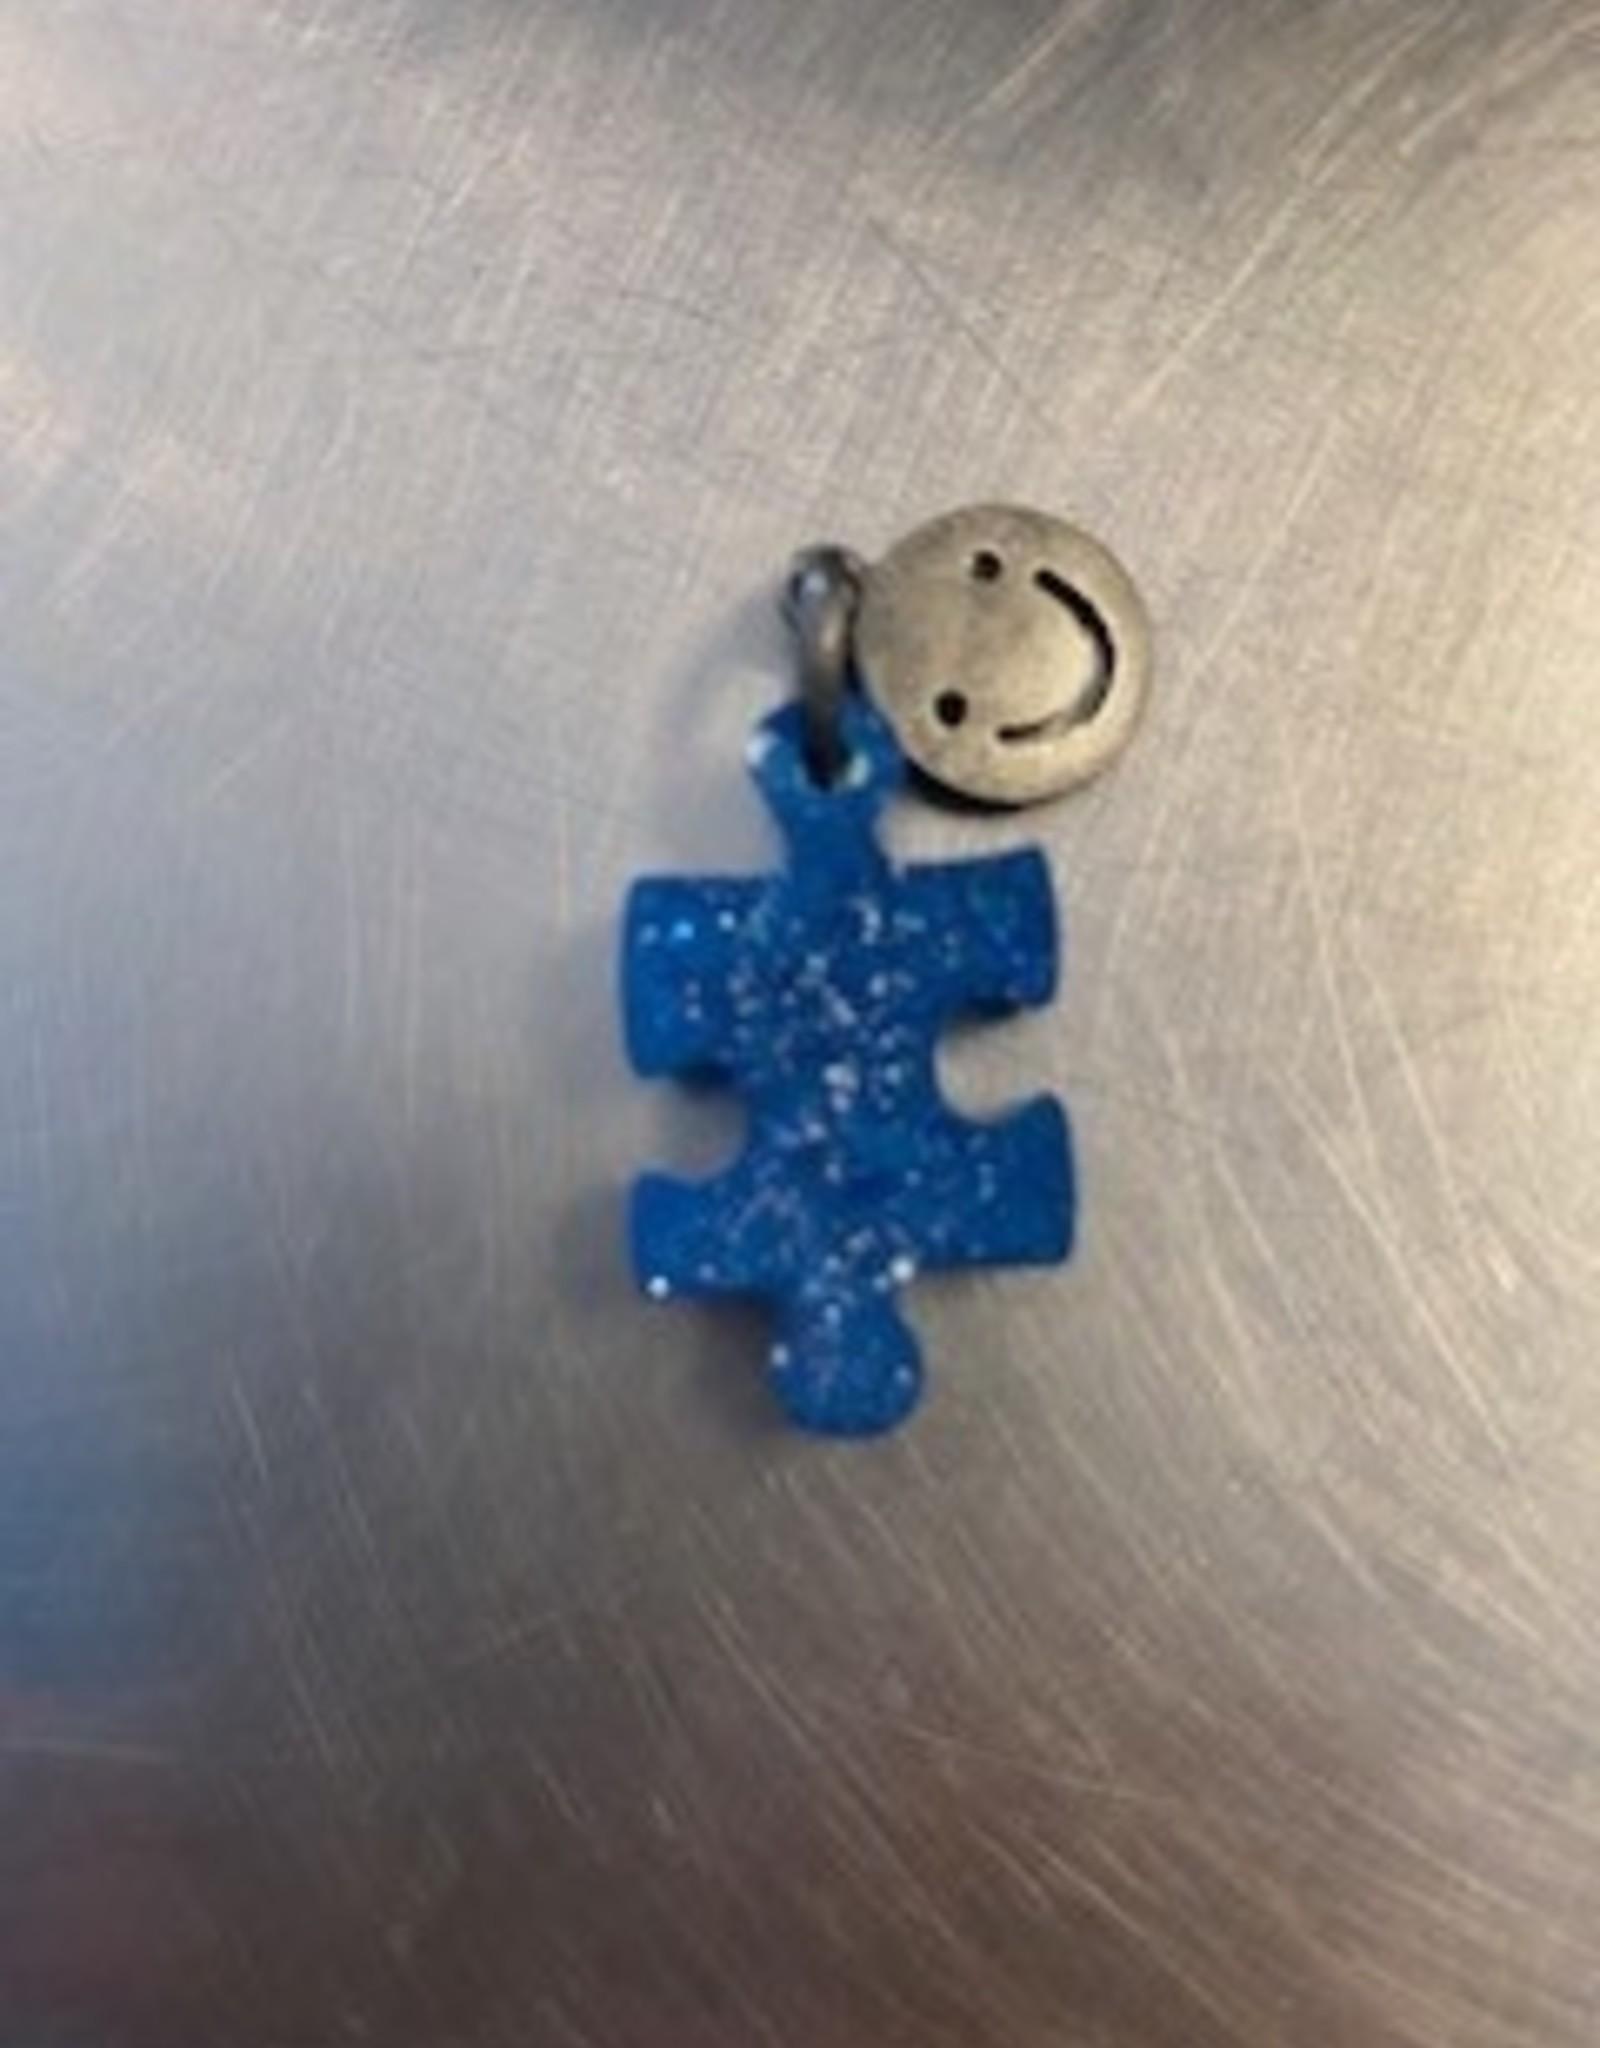 Tawny Kristine Blue Puzzle Piece Pendant